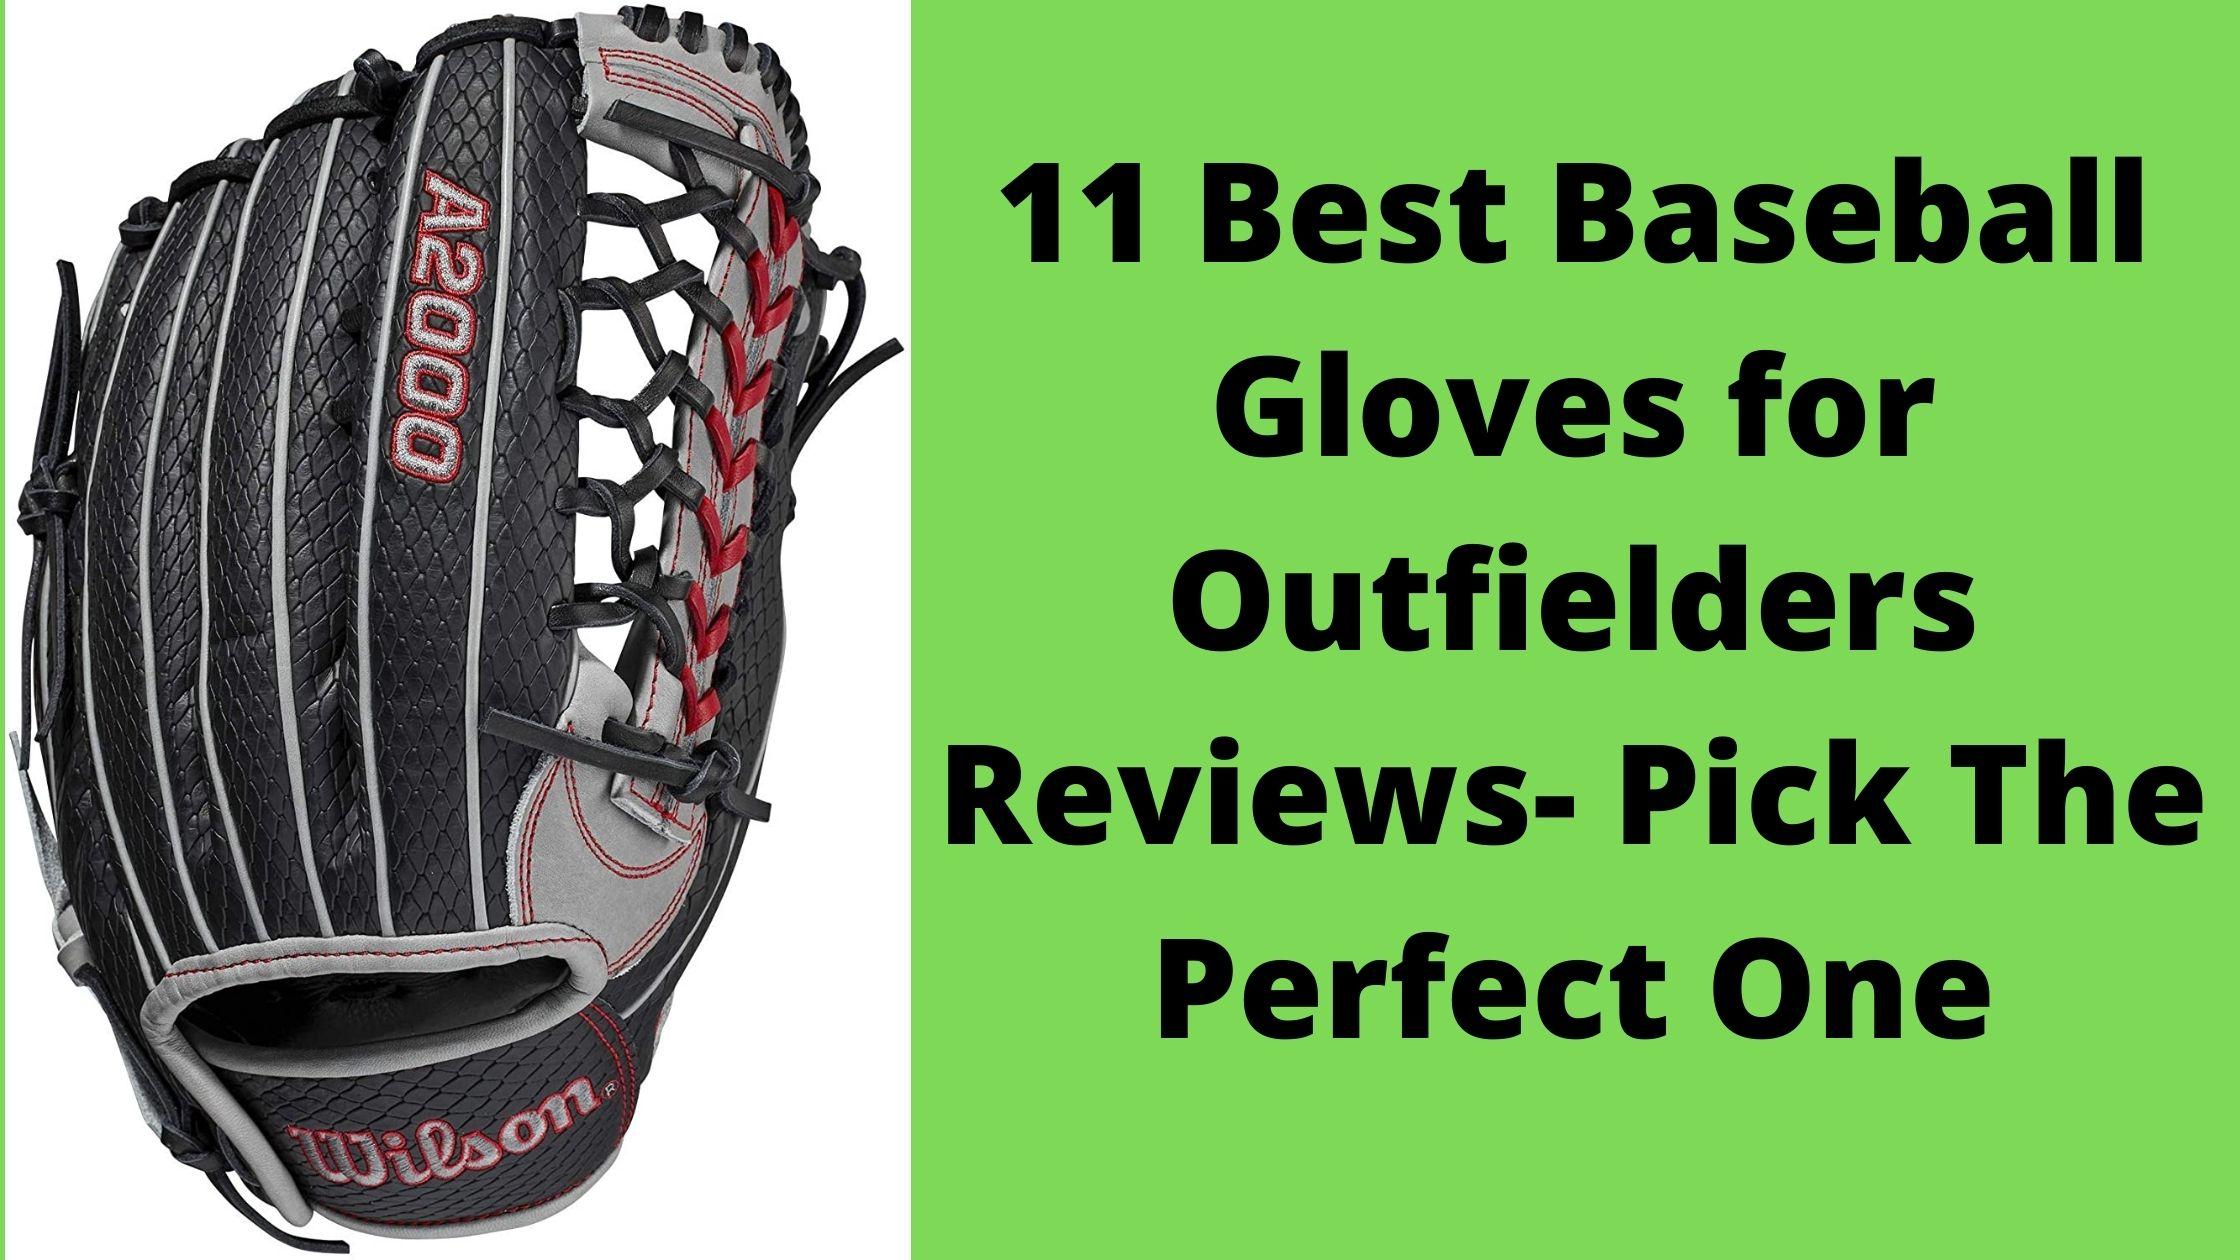 Best Baseball Gloves for Outfielders